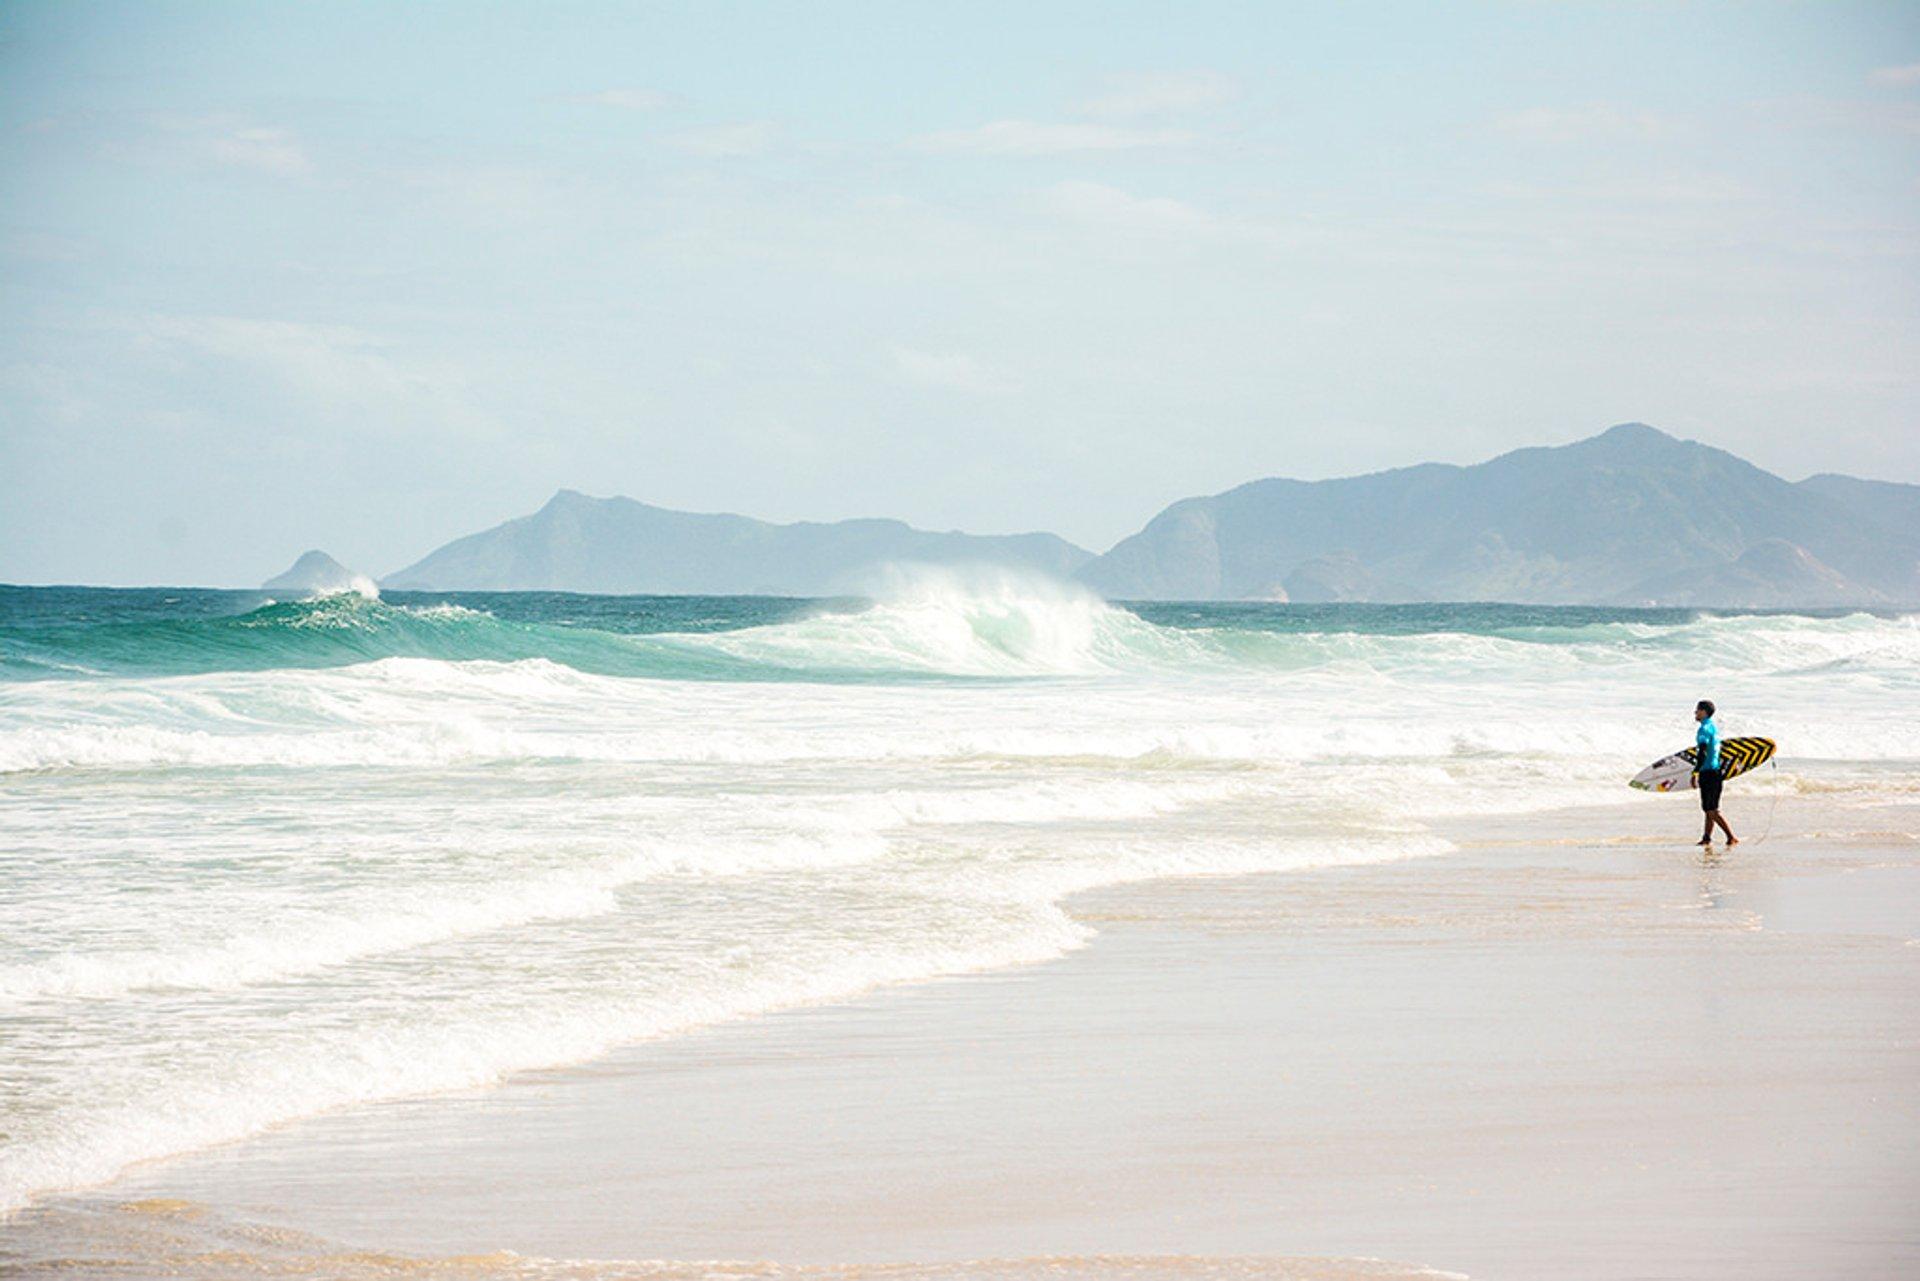 Surfing in Rio de Janeiro 2020 - Best Time